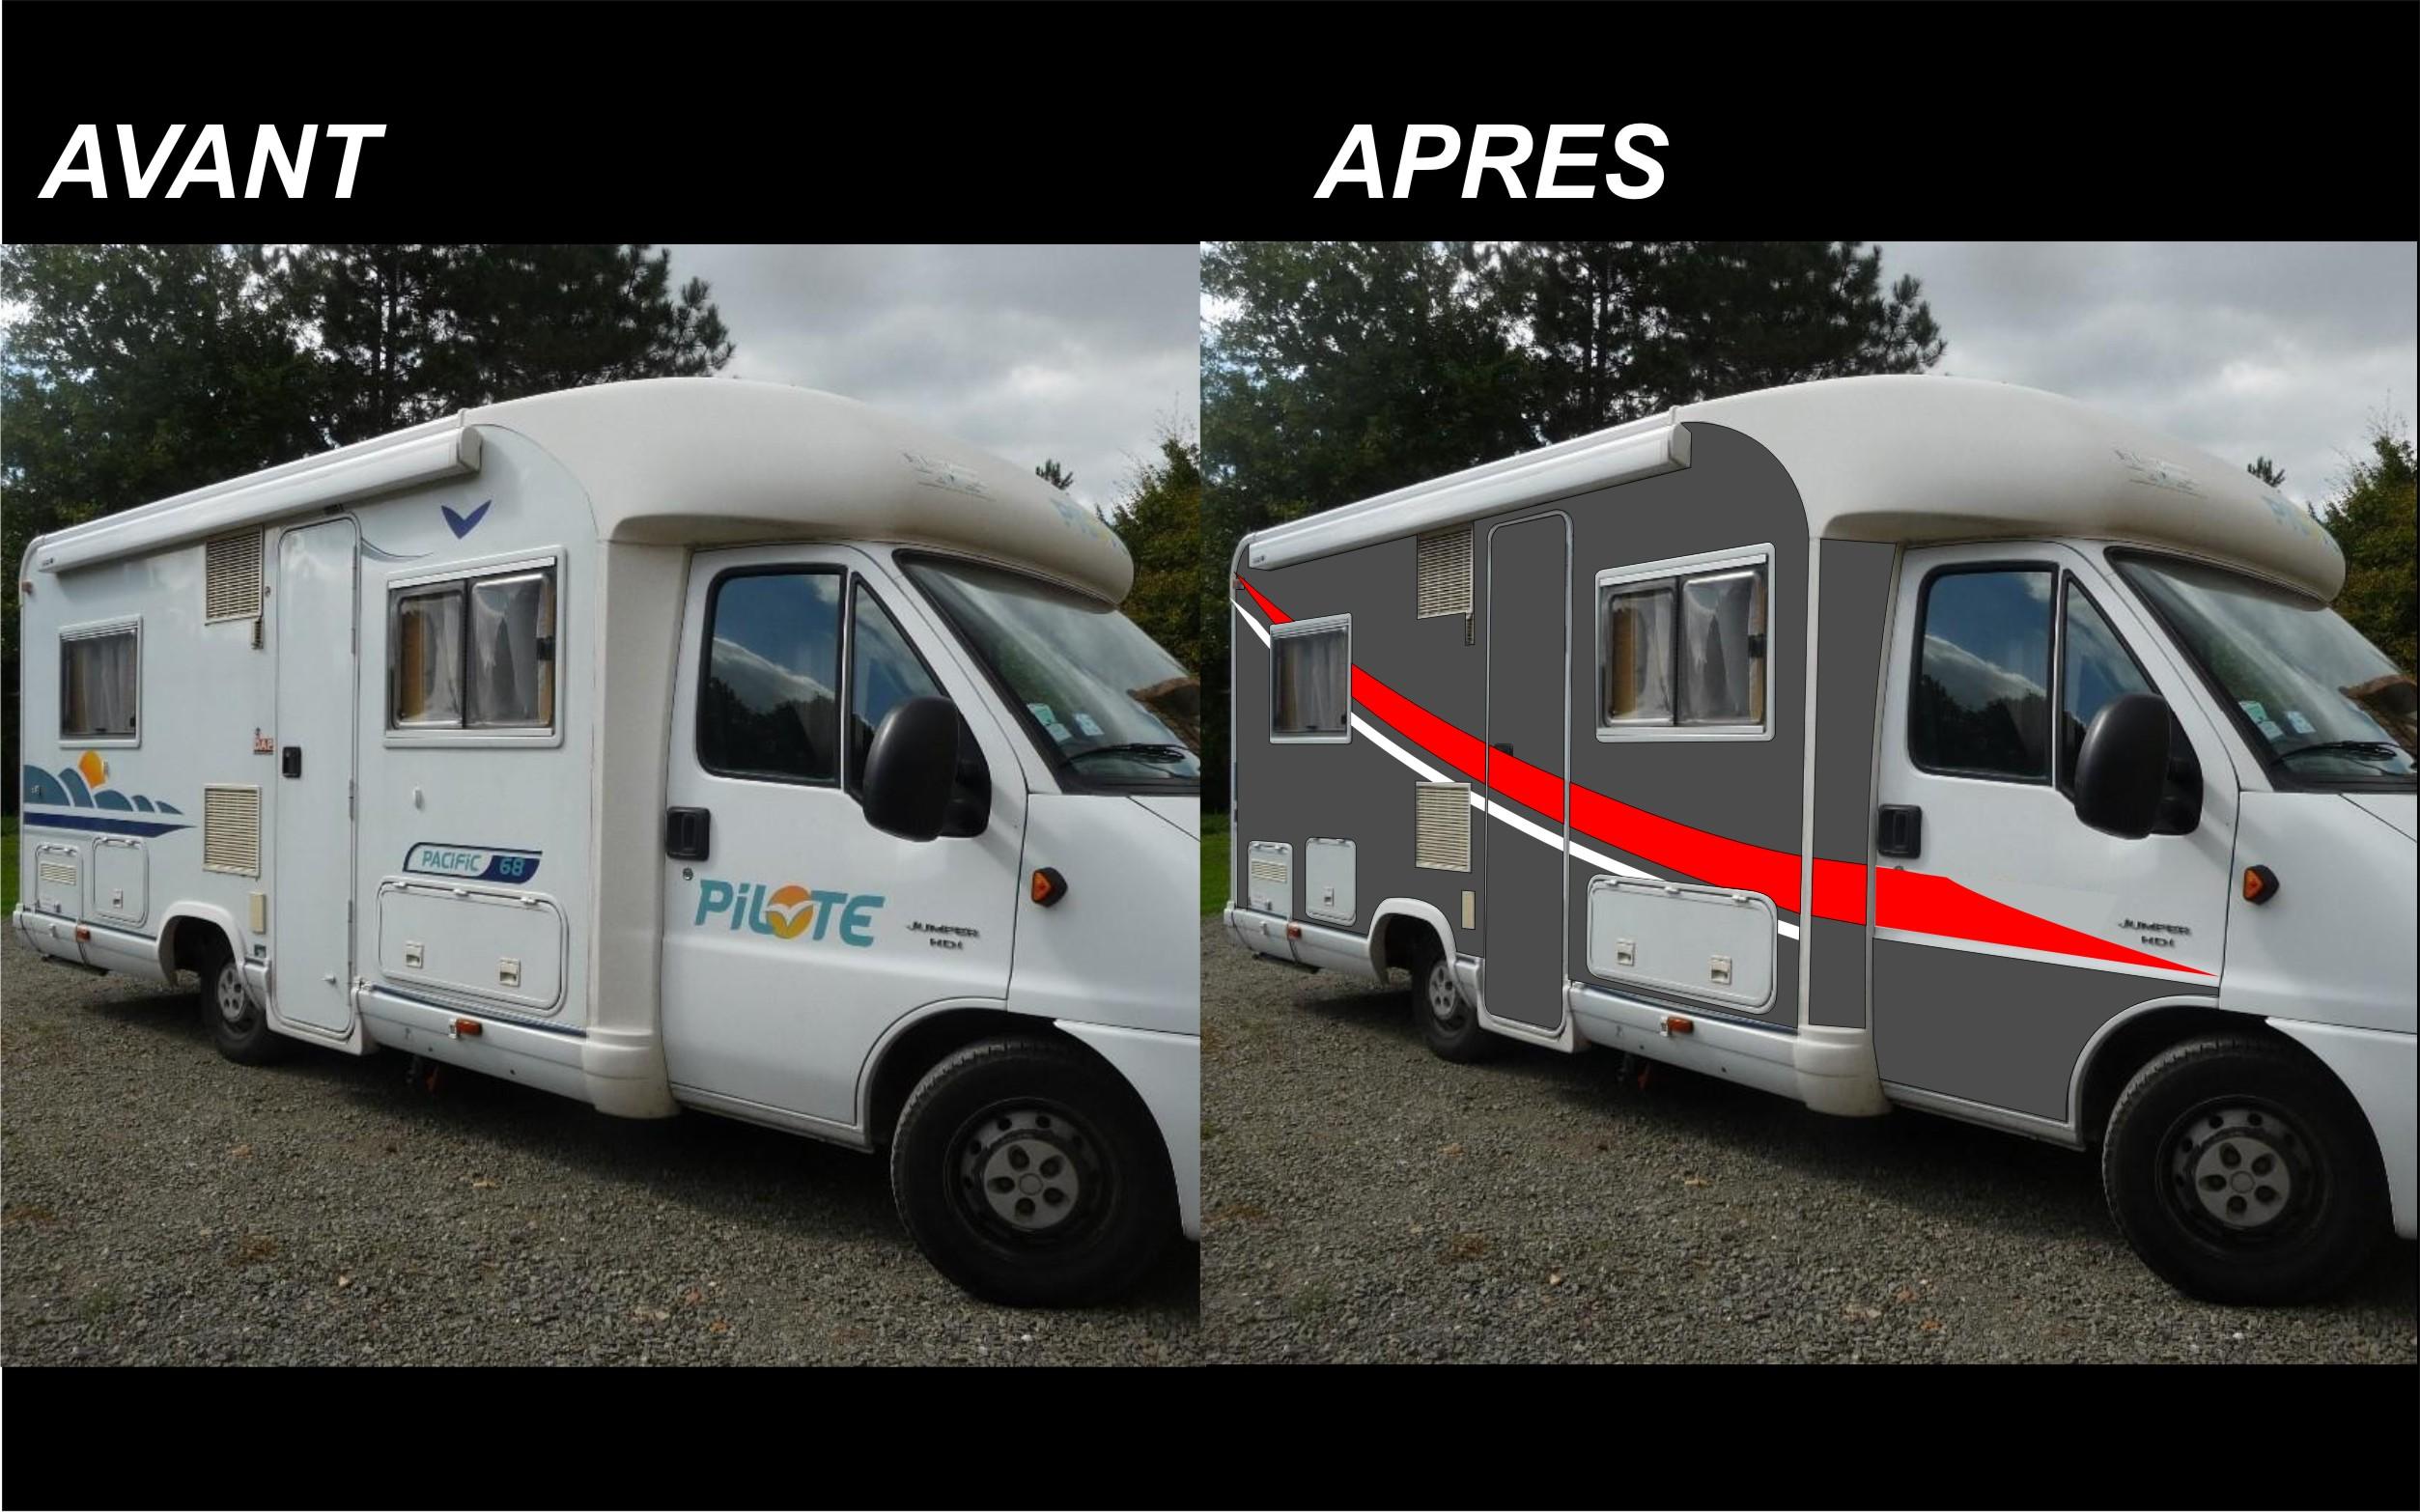 decoration exterieur de camping car. Black Bedroom Furniture Sets. Home Design Ideas